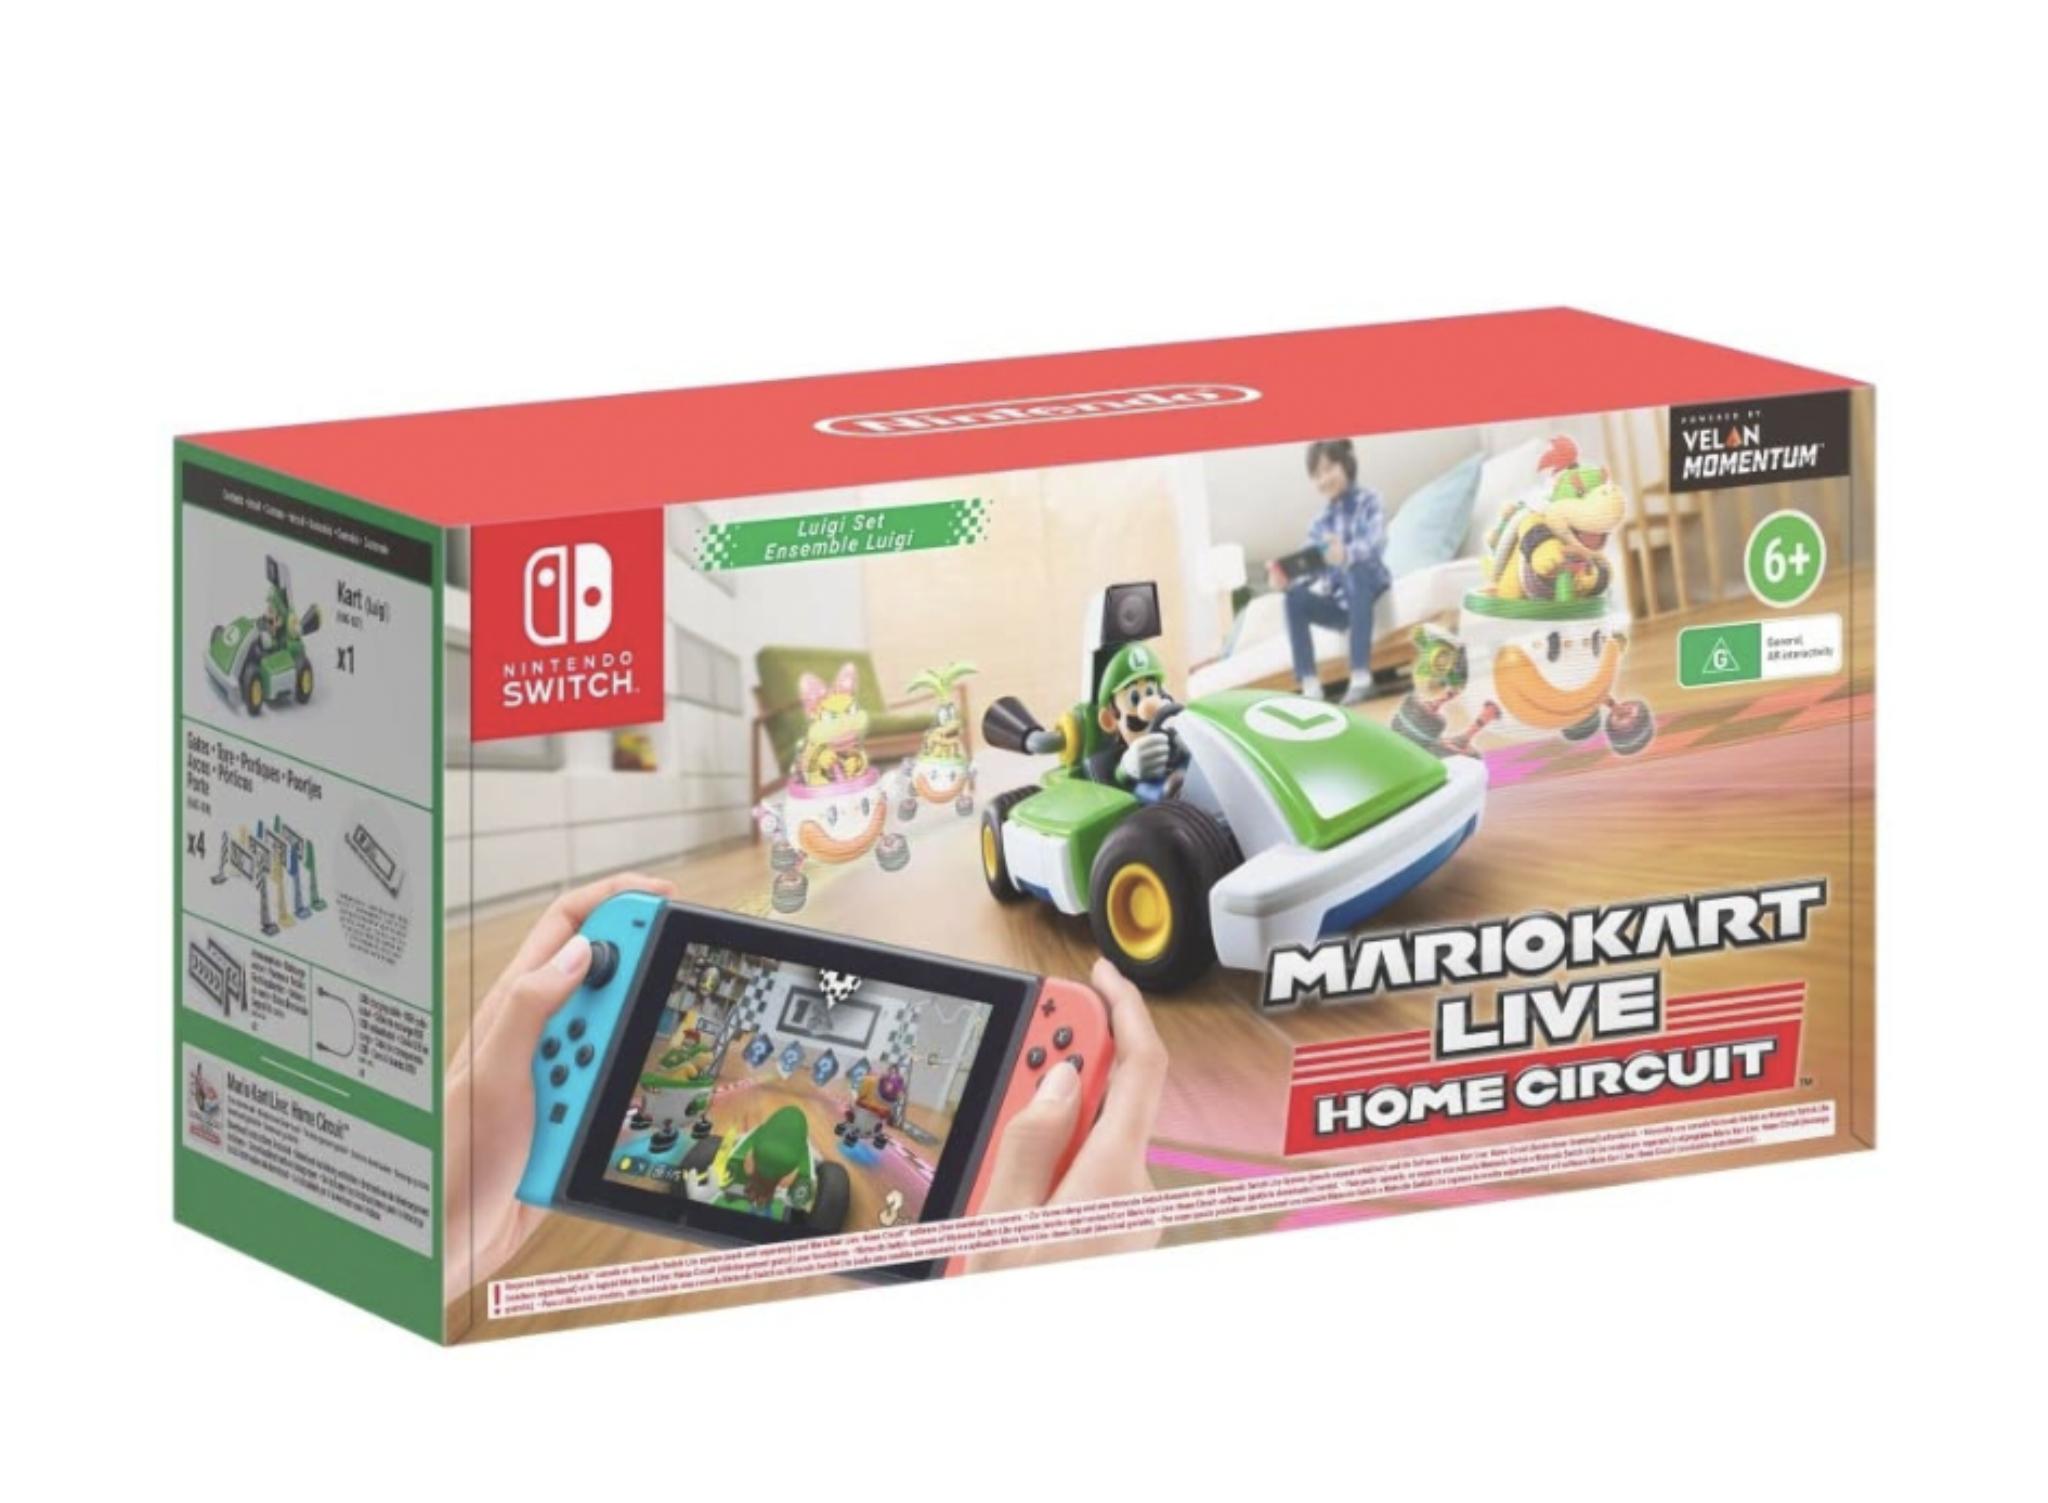 Mario Kart Live: Home Circuit - Luigi (Nintendo Switch) Used Like New £65.06 @ Amazon Warehouse